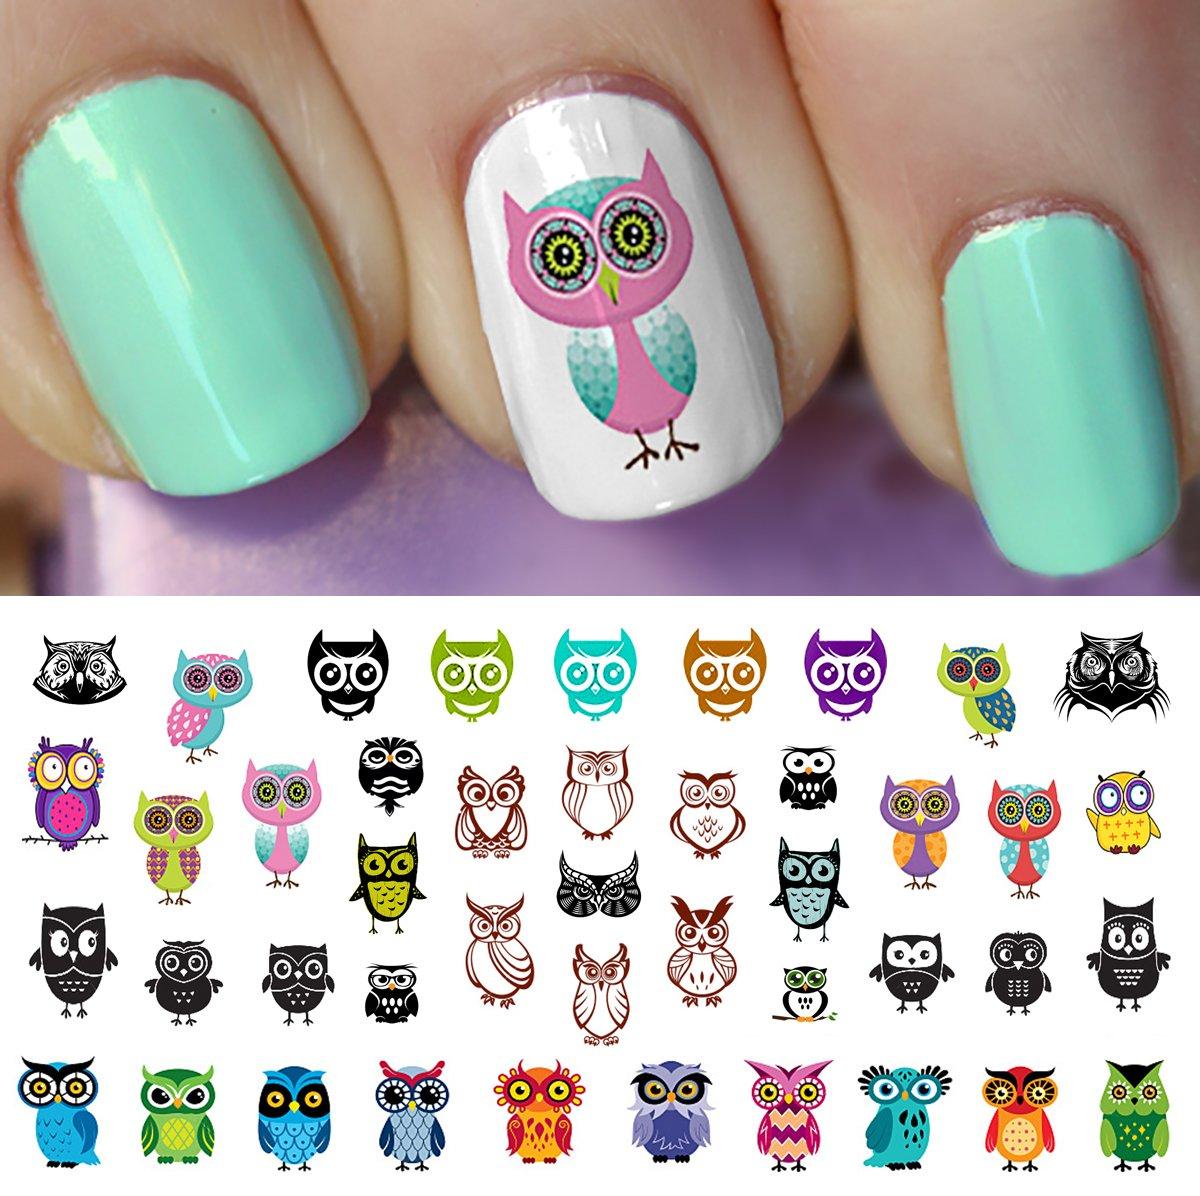 Amazon owl assortment nail art waterslide decals set 1 owl assortment nail art waterslide decals set 2 salon quality prinsesfo Images